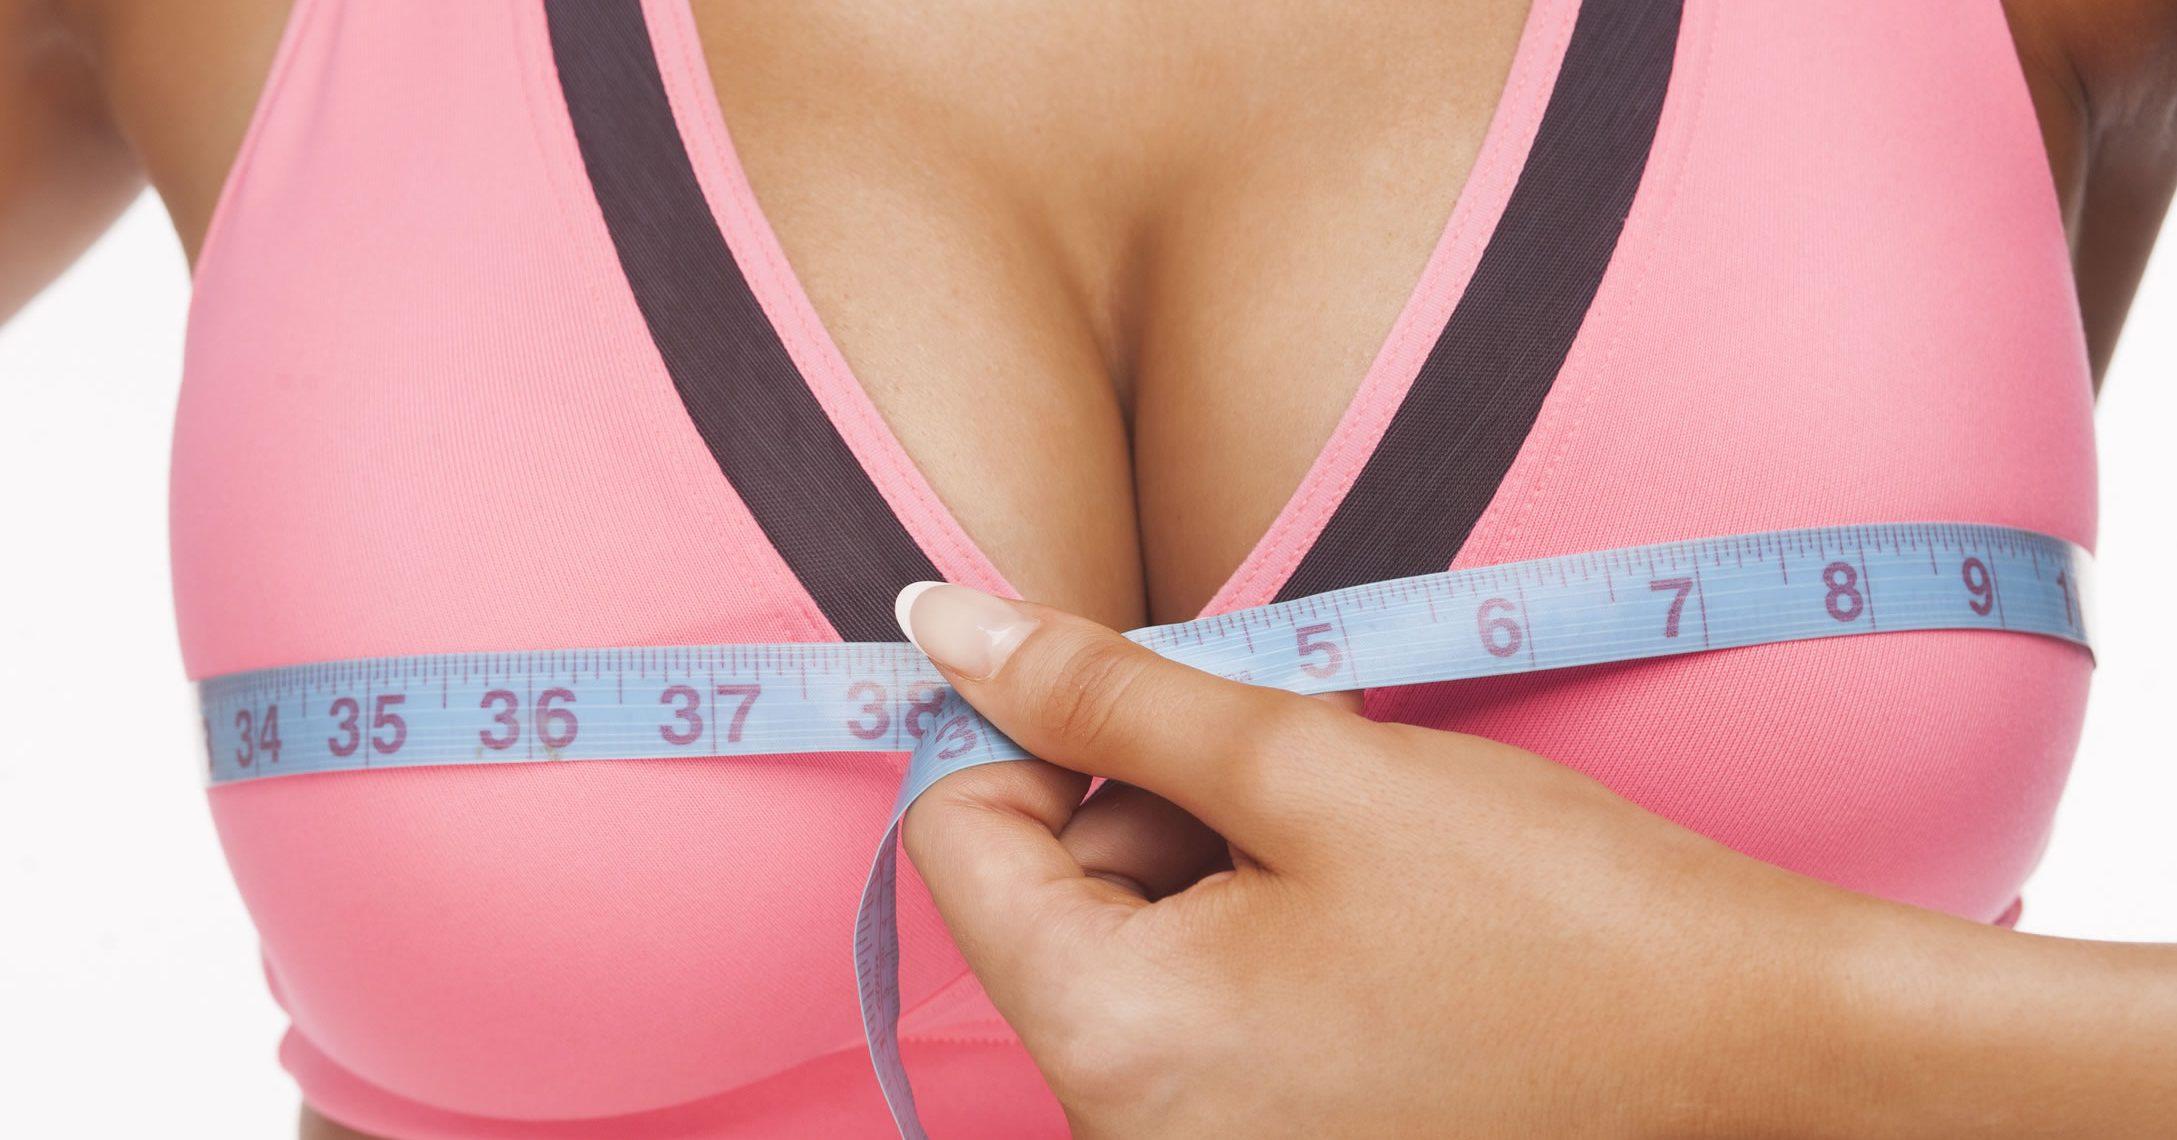 Materassino seno prosperoso 2